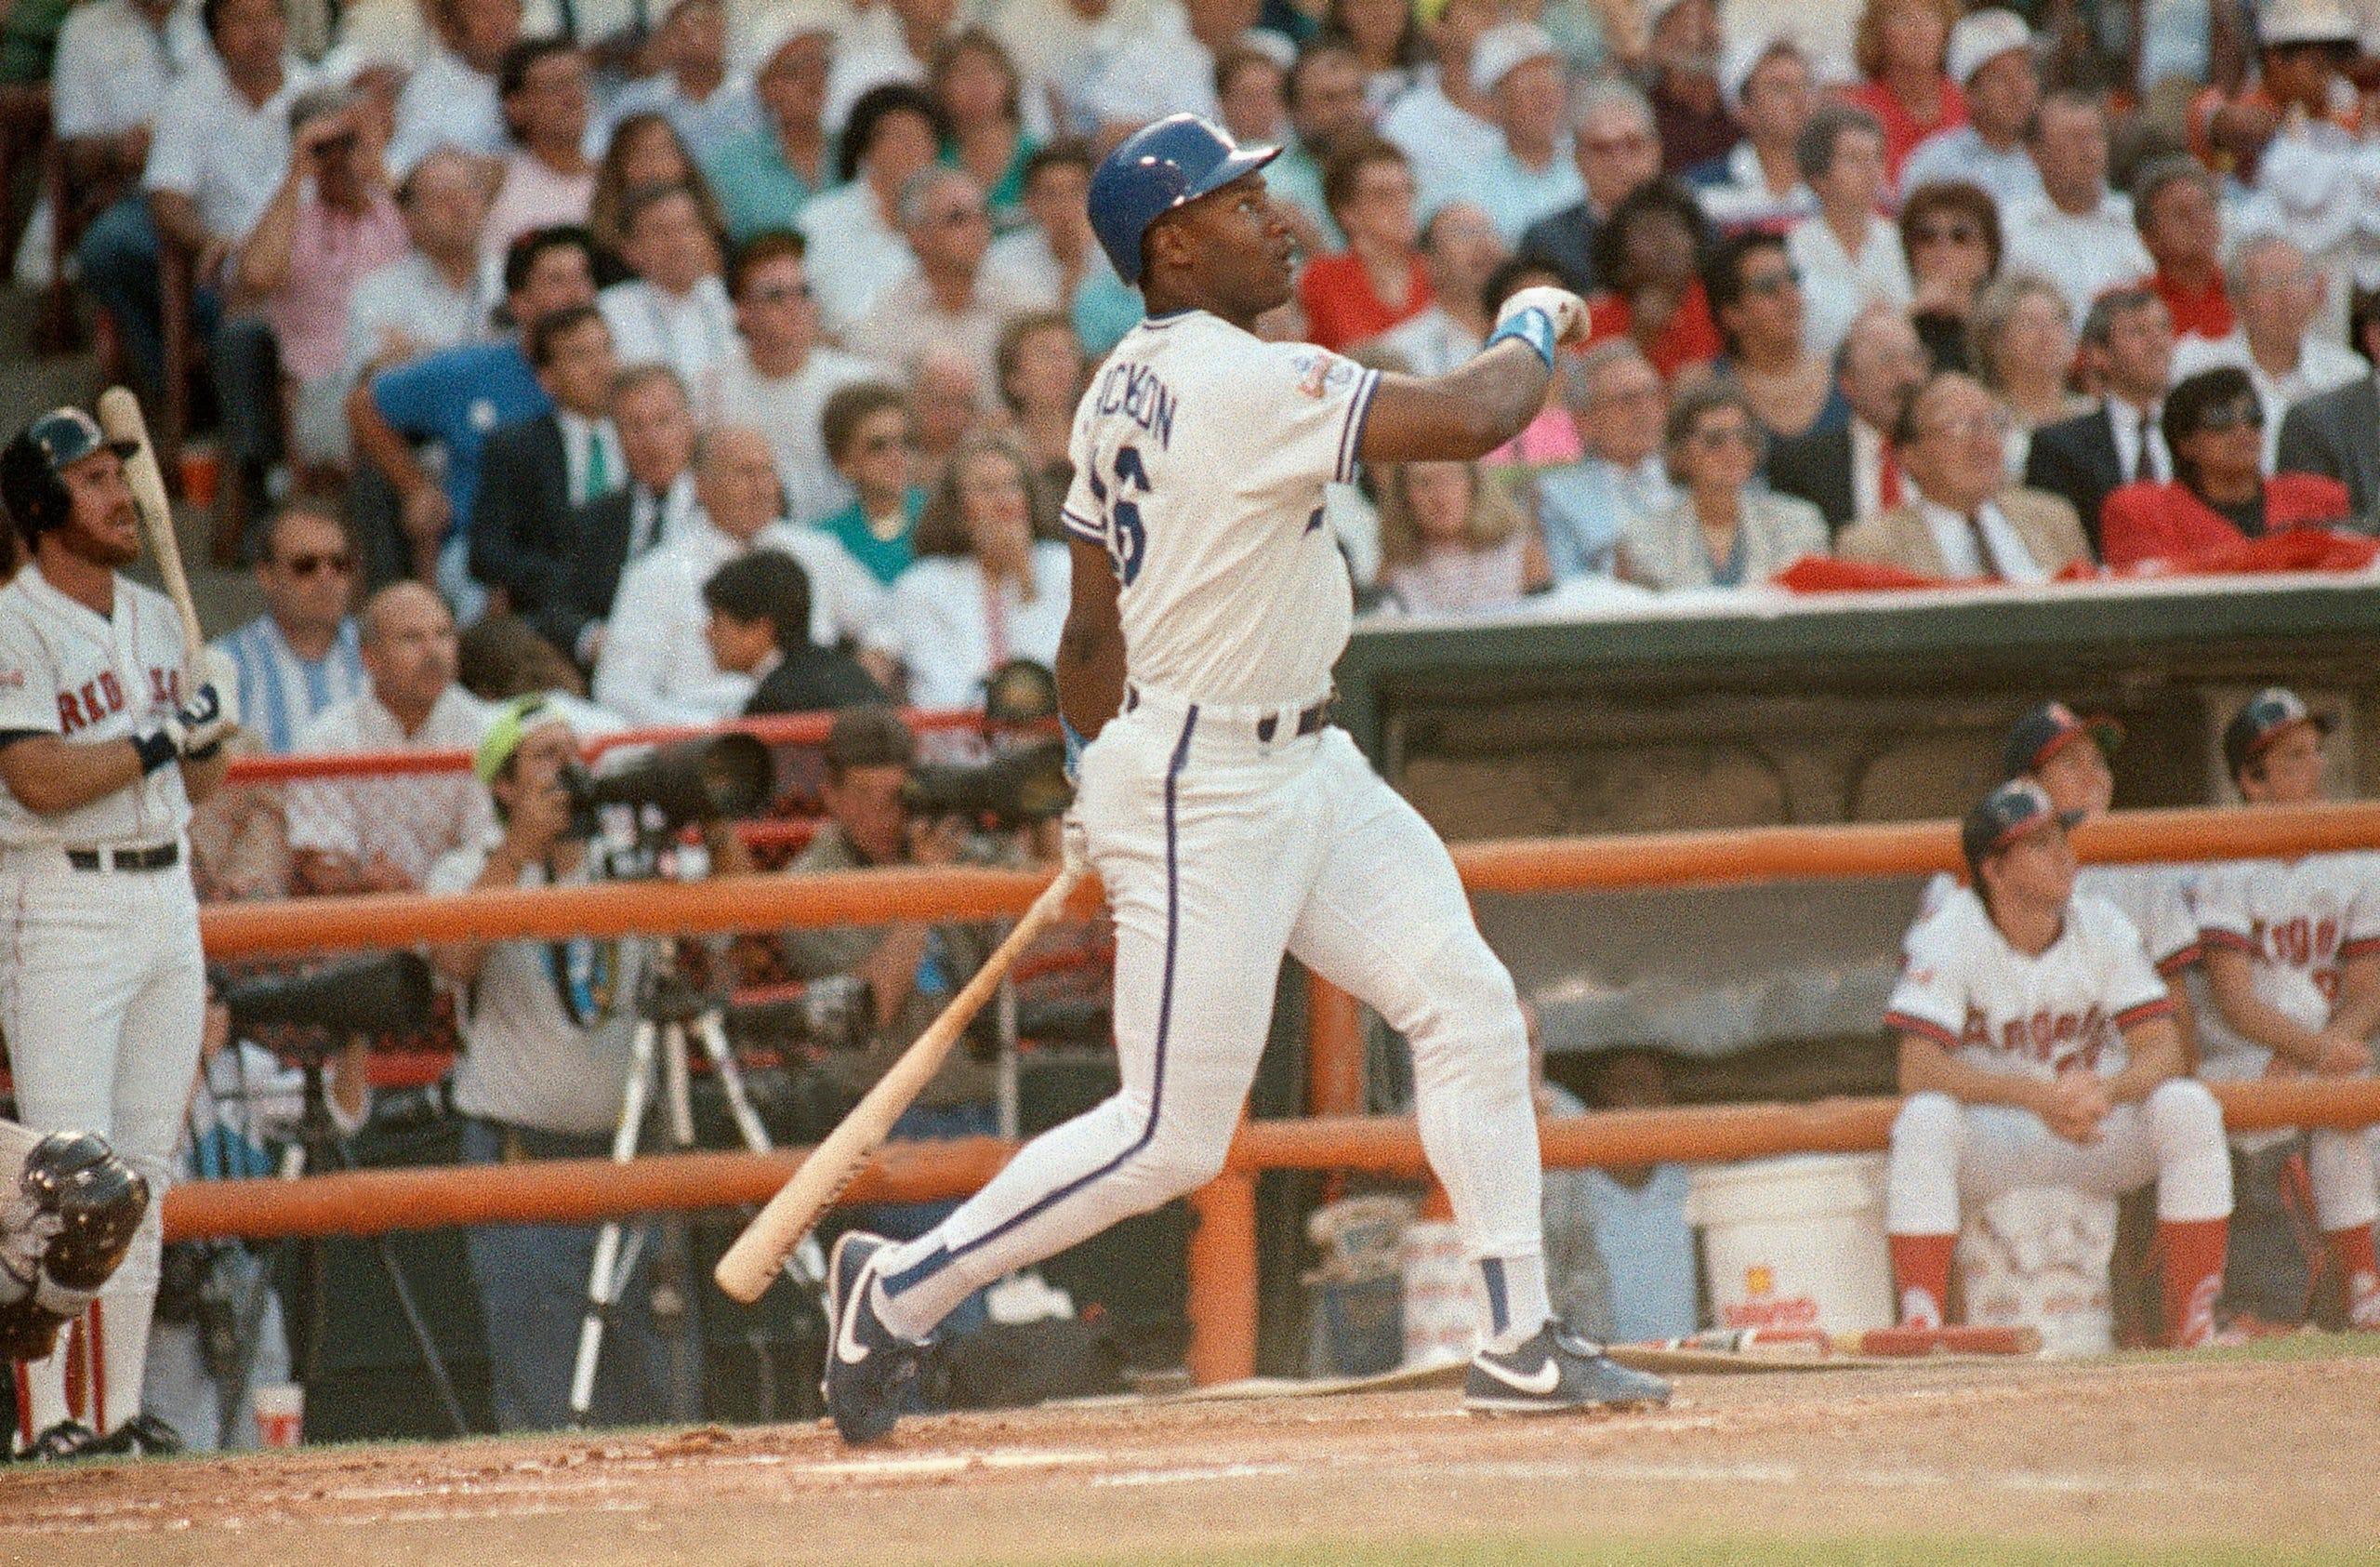 Bo Jackson: Tampa Bay Buccaneers(1986, 1st round); Los Angeles Raiders (1987, 7th round)